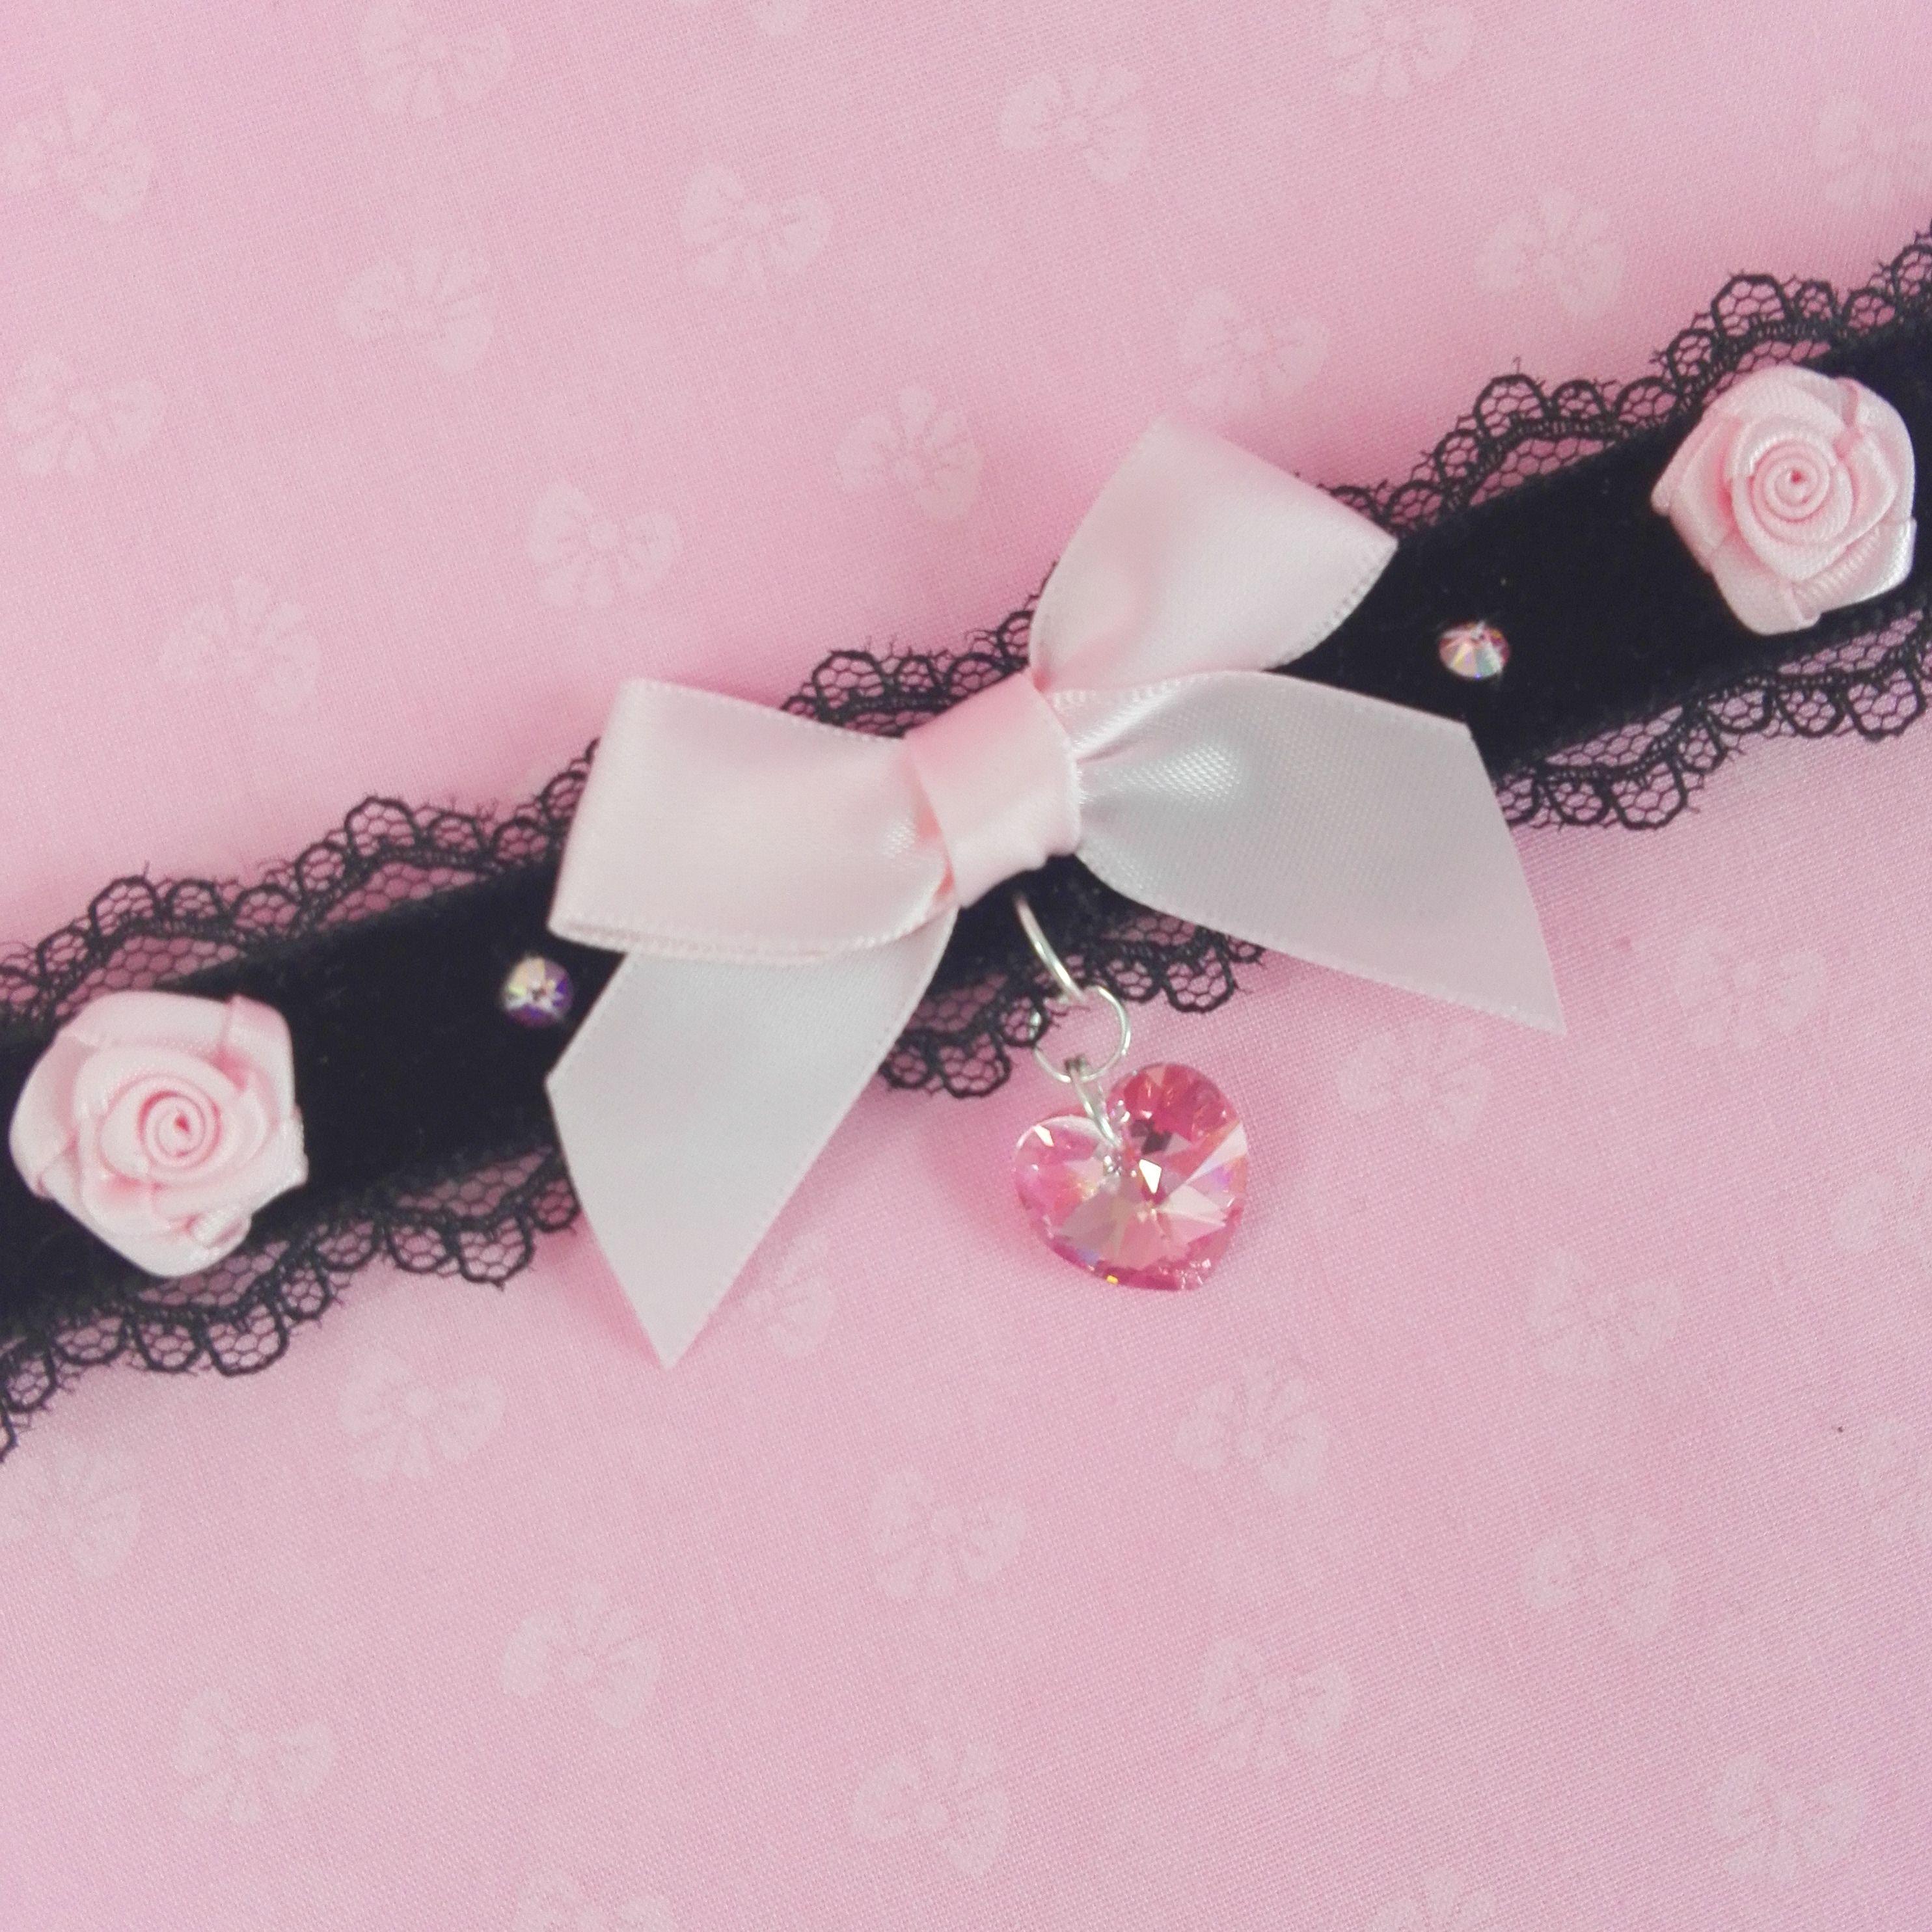 Peach Flamingo Kitten Play Collar In 2020 Kitten Play Collar Rose Gold Heart Peach Pink